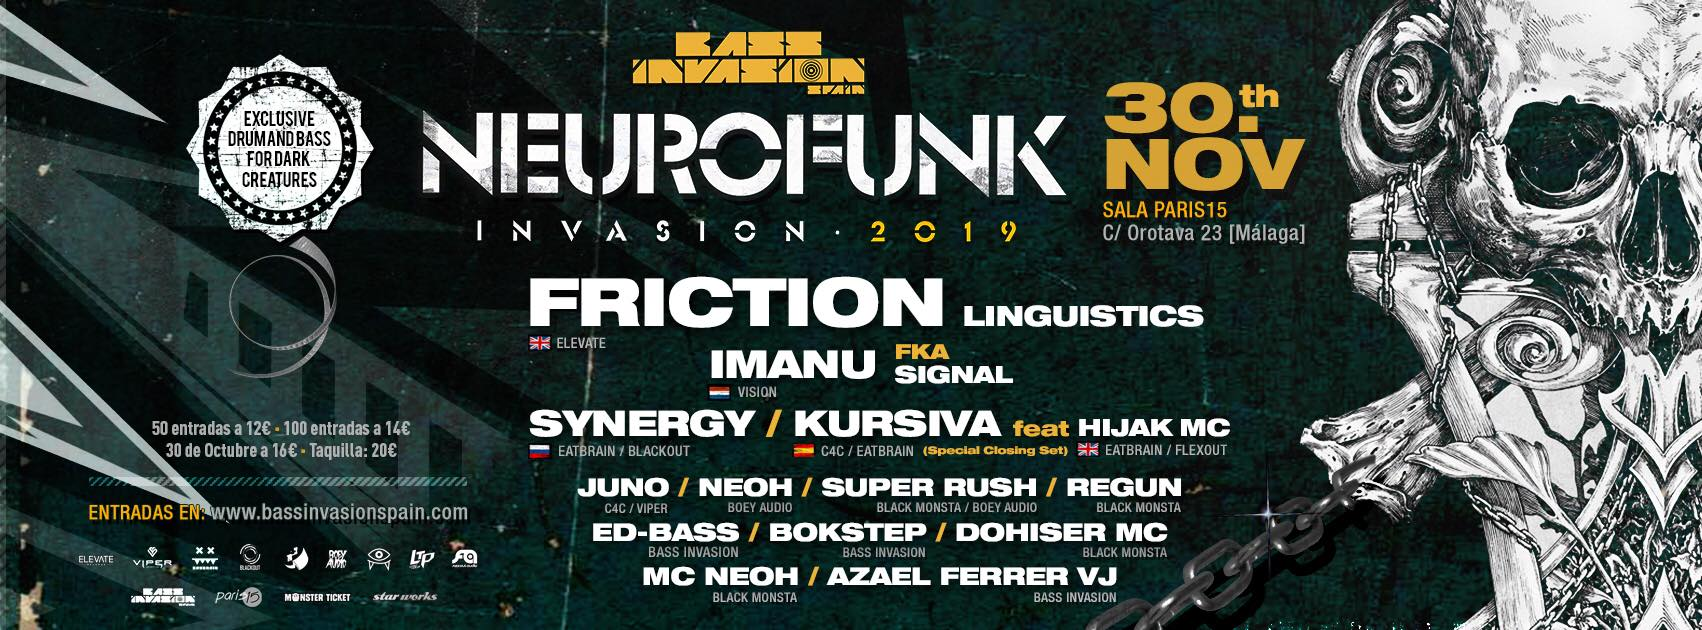 Neurofunk-2019